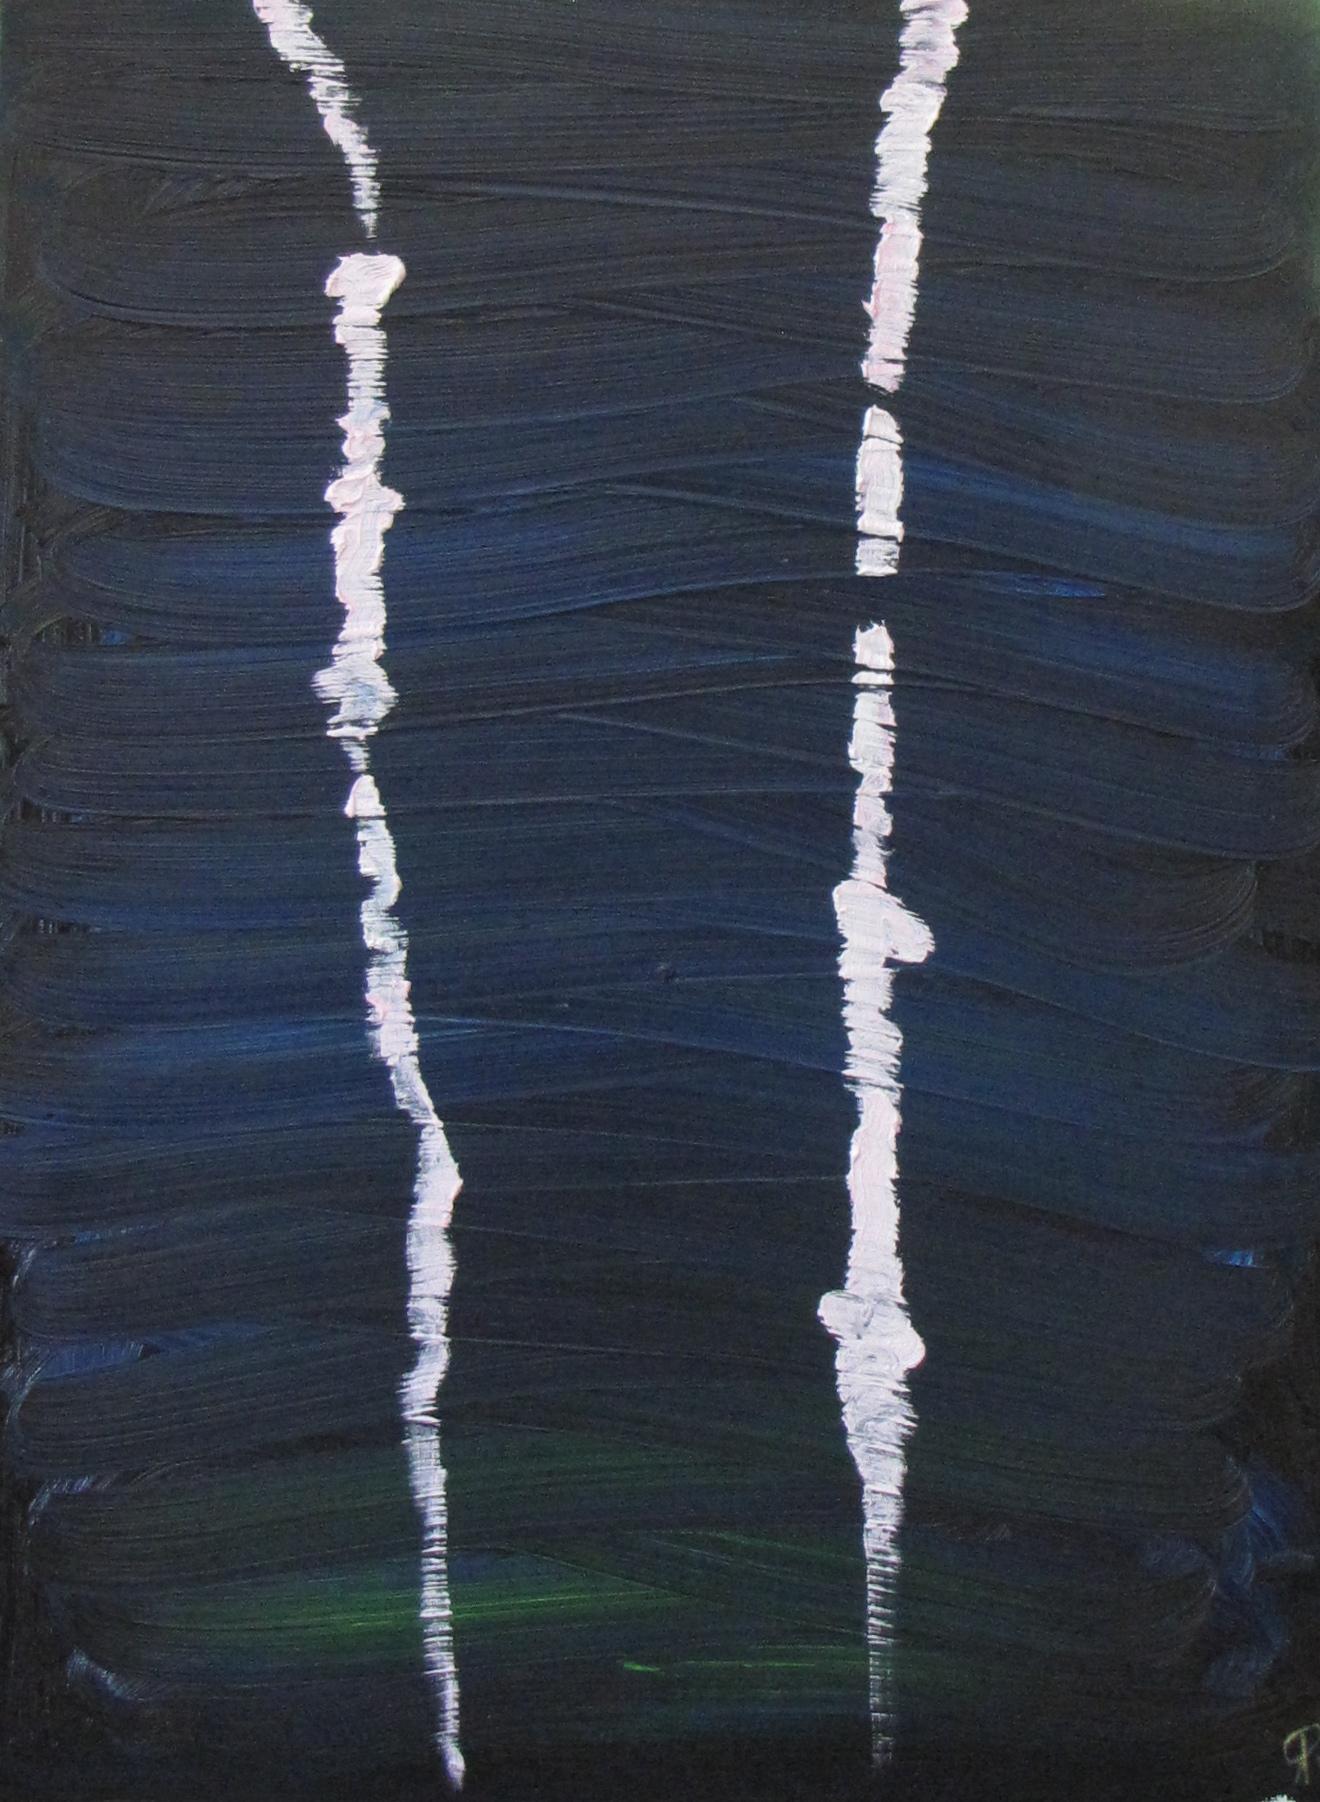 Flight of the Honeybee, 4 p.m., Russell Steven Powell oil on canvas, 18x24